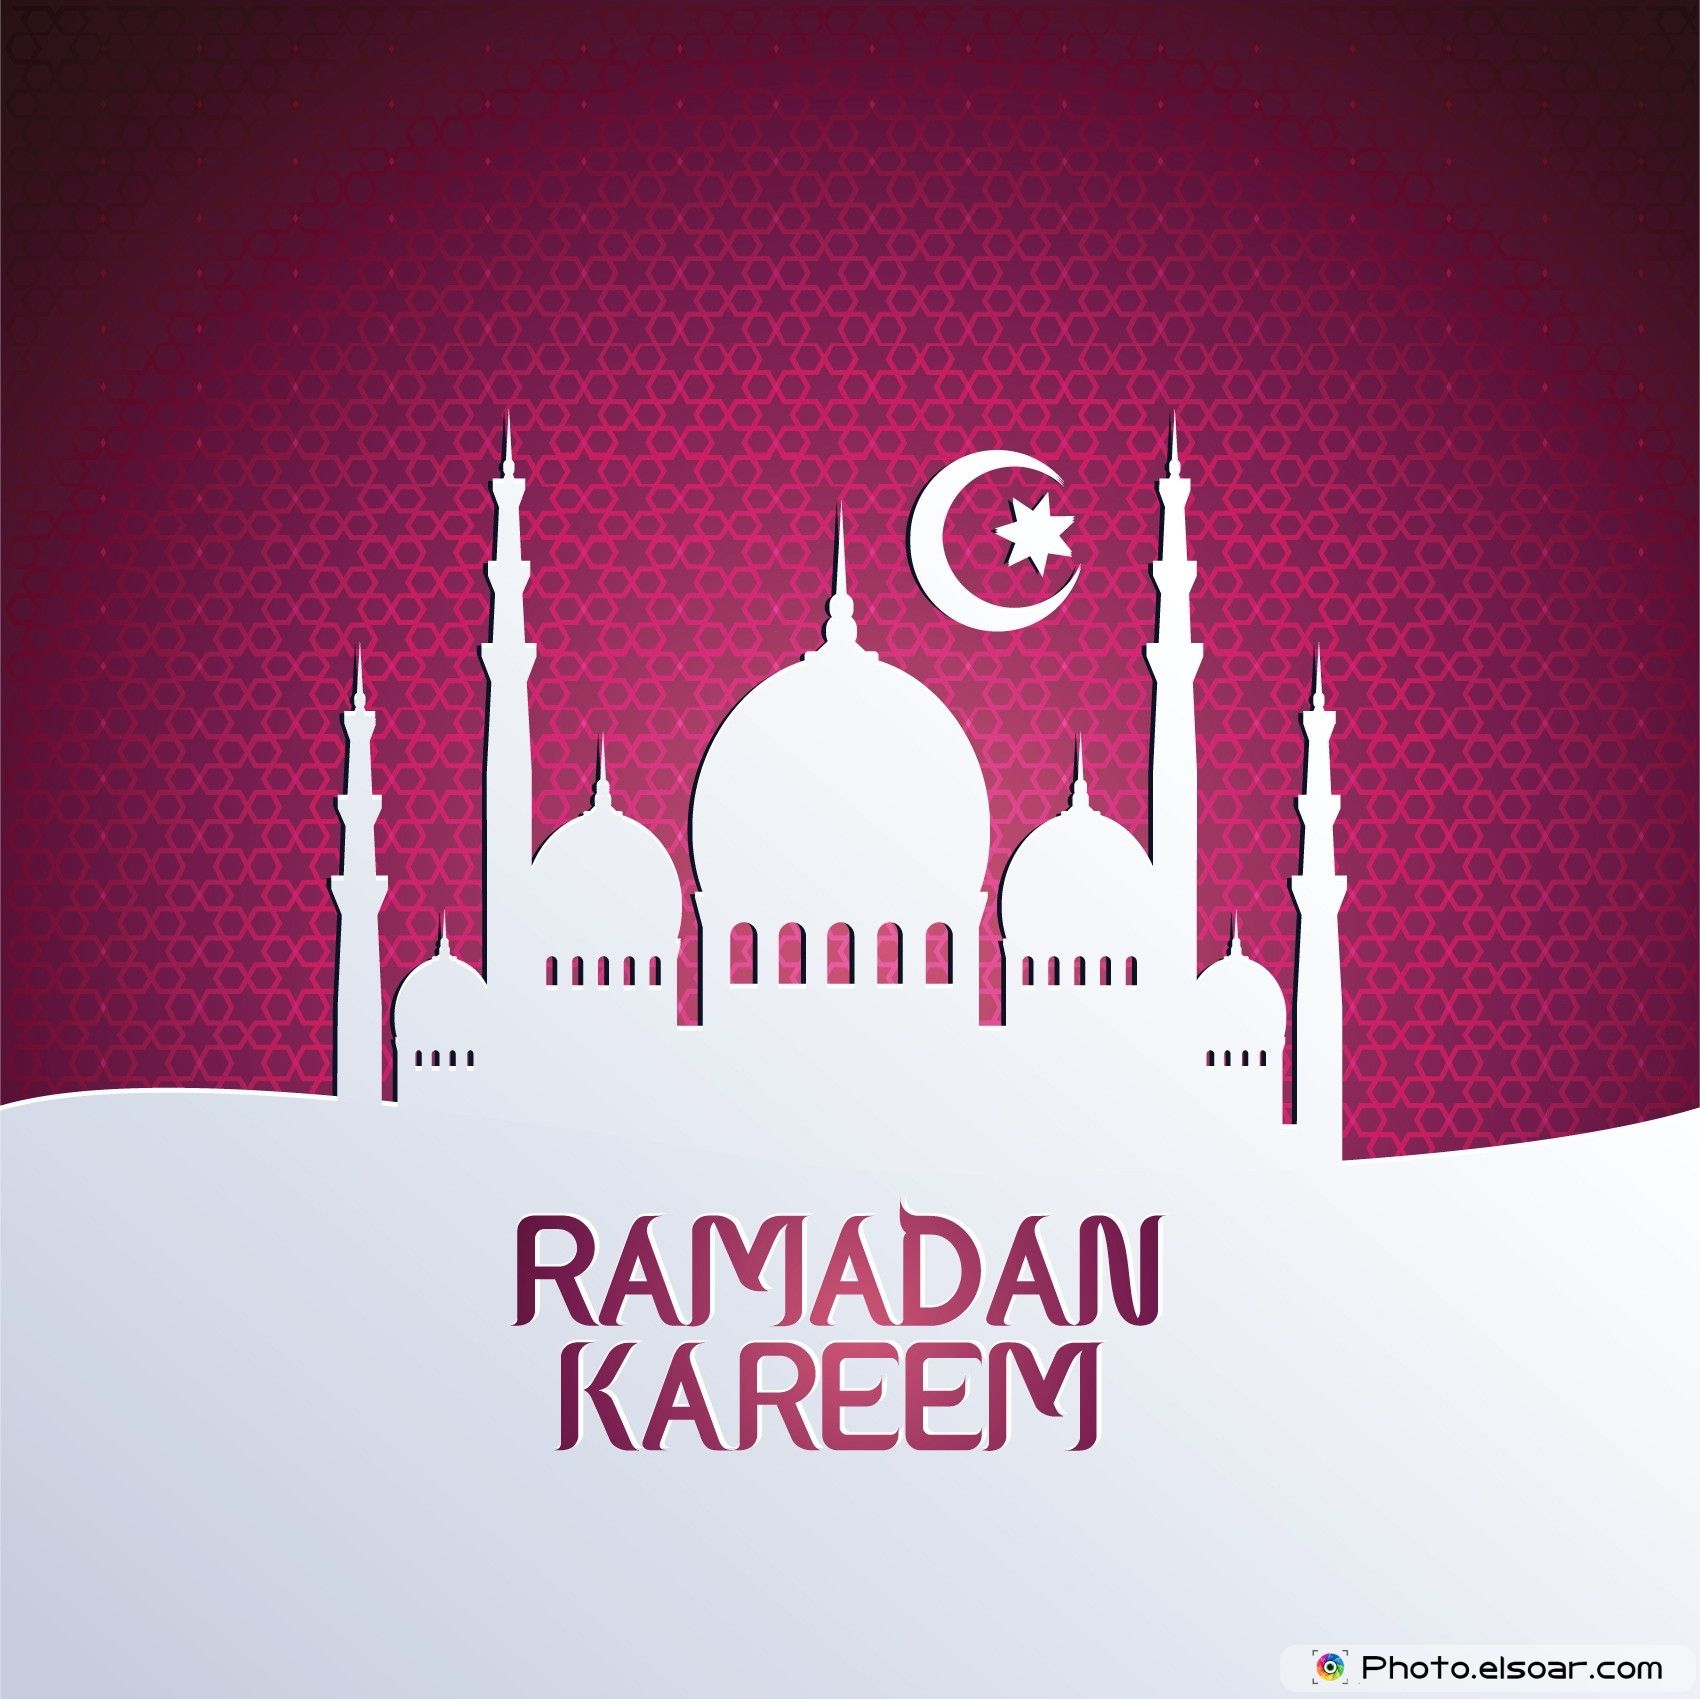 Wallpaper Ramadan Kareem high definition | Ramadan | Pinterest ... for Ramadan Kareem Wallpapers Hd  55dqh